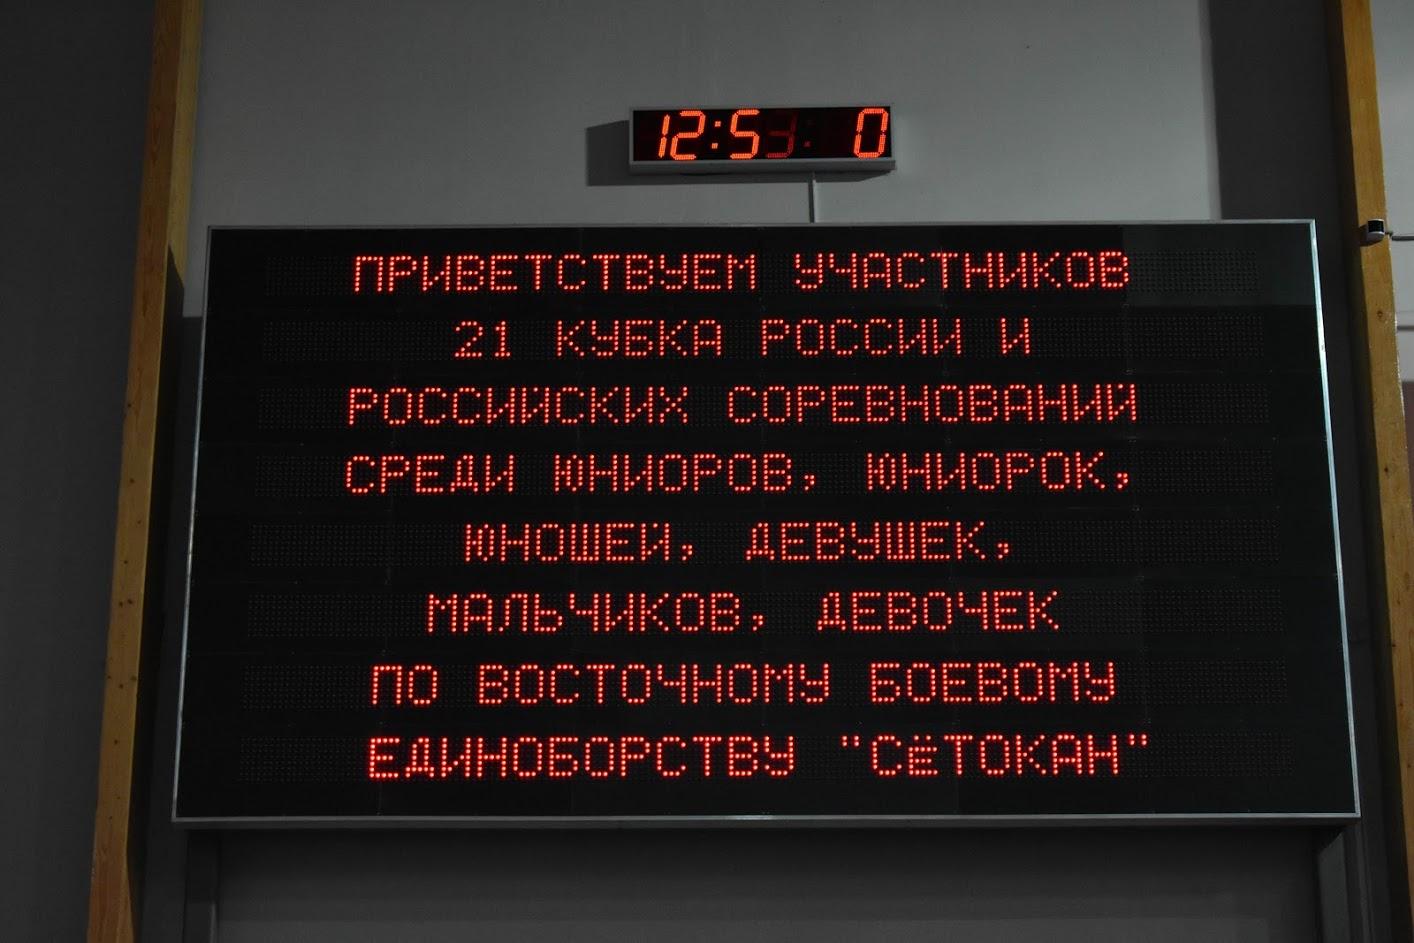 Москвичи достойно представили столицу на Кубке России 2019!